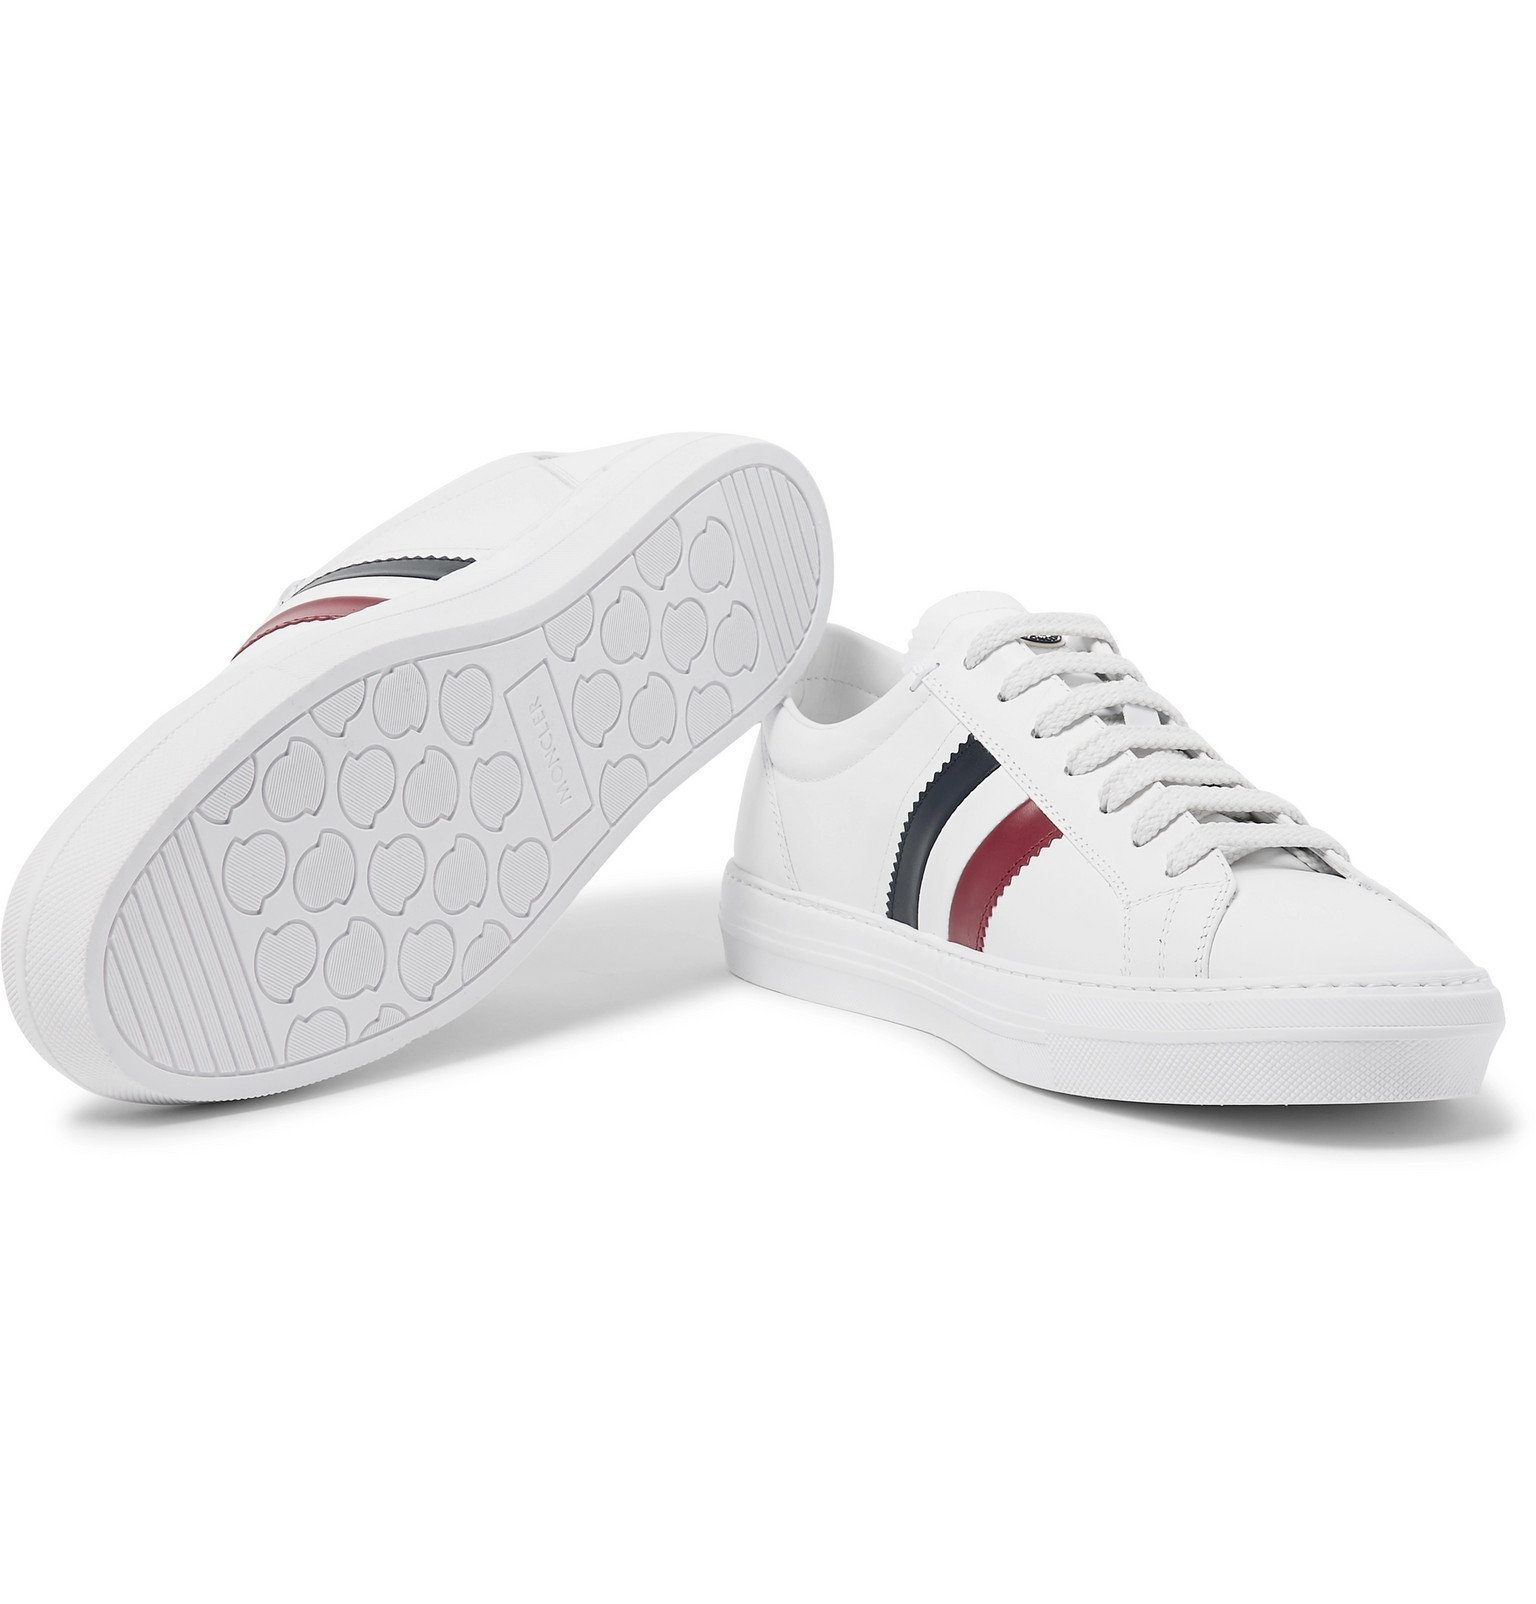 Moncler - New Monaco Striped Leather Sneakers - White